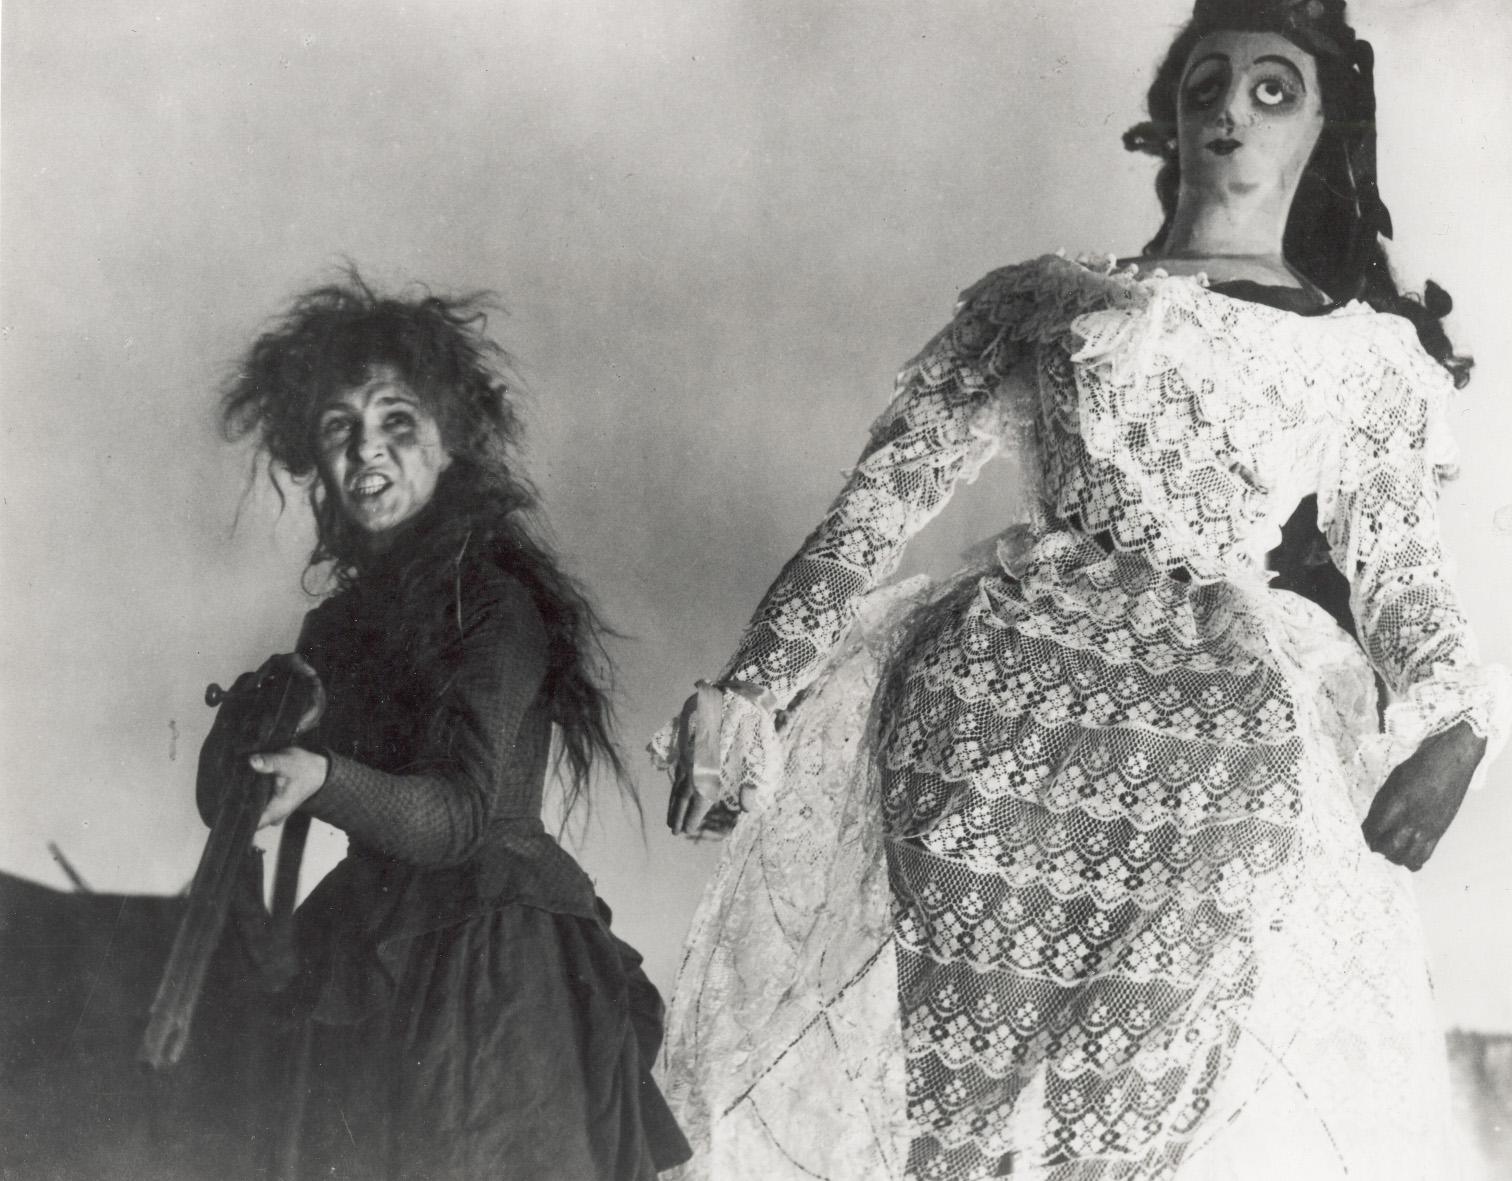 Yelena Kuzmina (Louise) in NOVYI VAVILON (Nuova Babilonia, URSS 1929) di Grigorij Kozintzev e Leonid Trauberg